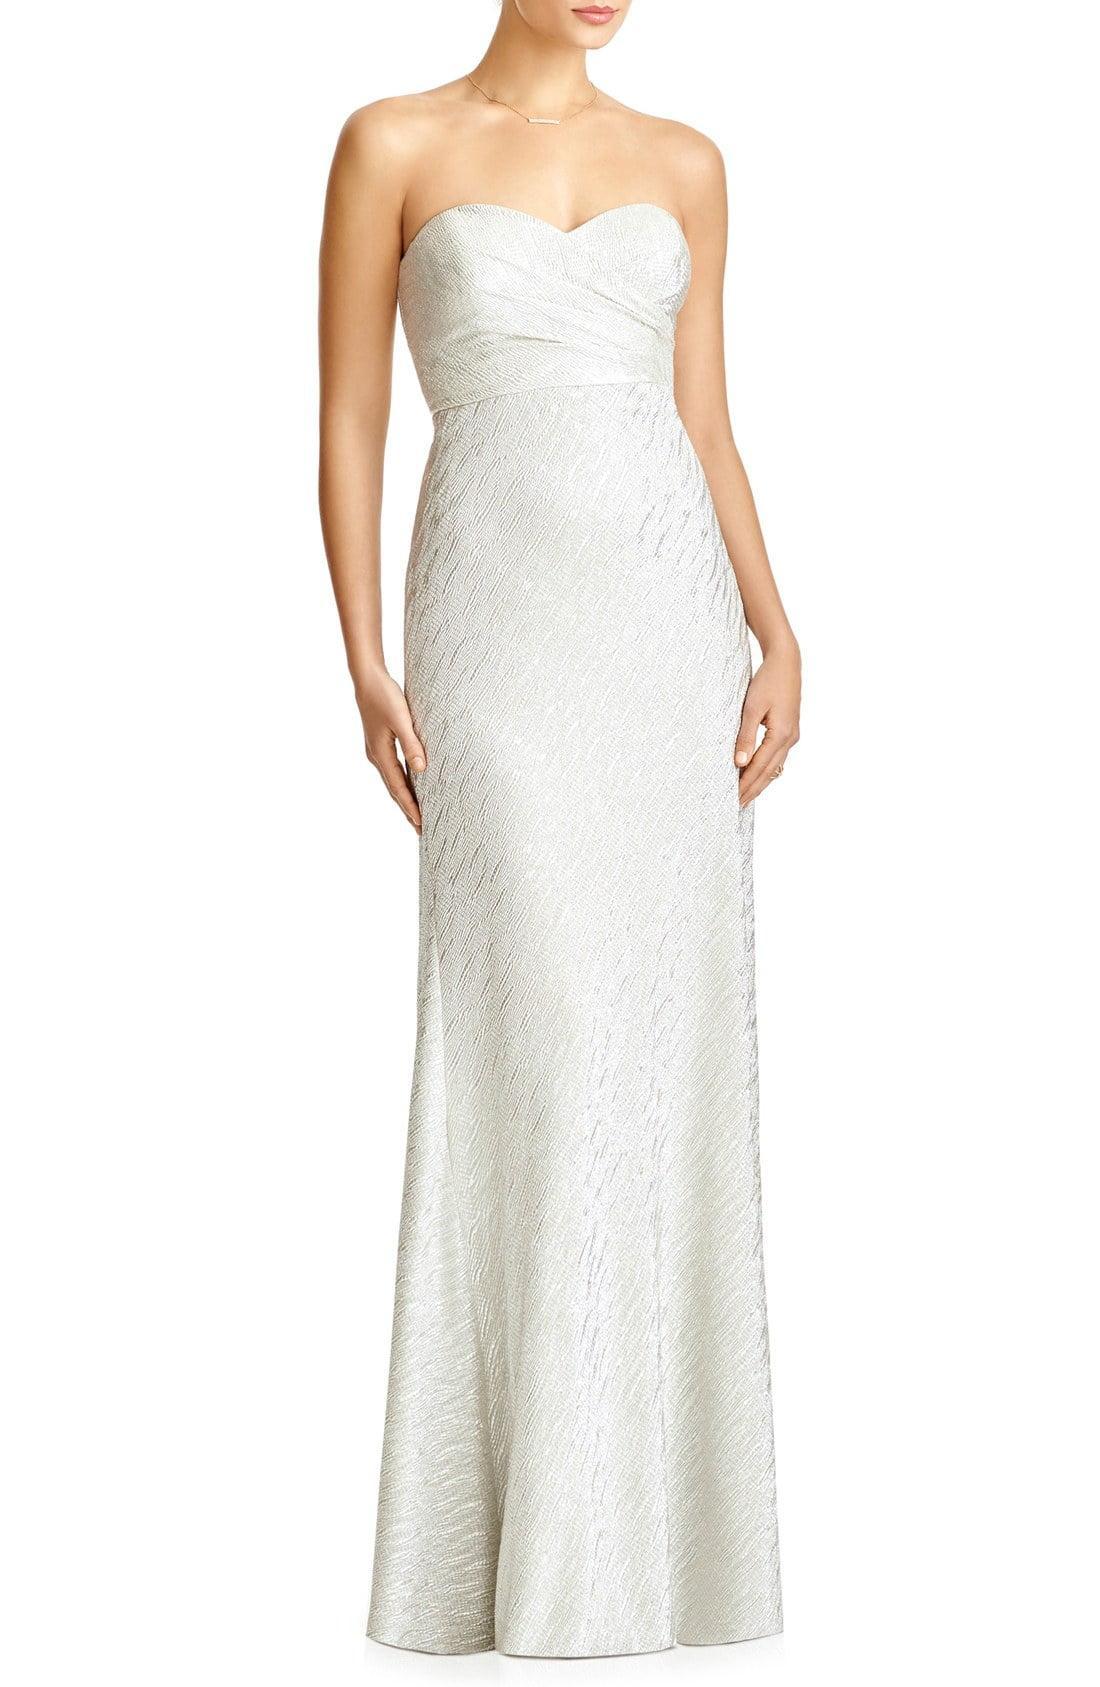 3b4305e336a7 Lyst - Jenny Yoo 'soho' Metallic Strapless Empire Waist Gown in Metallic